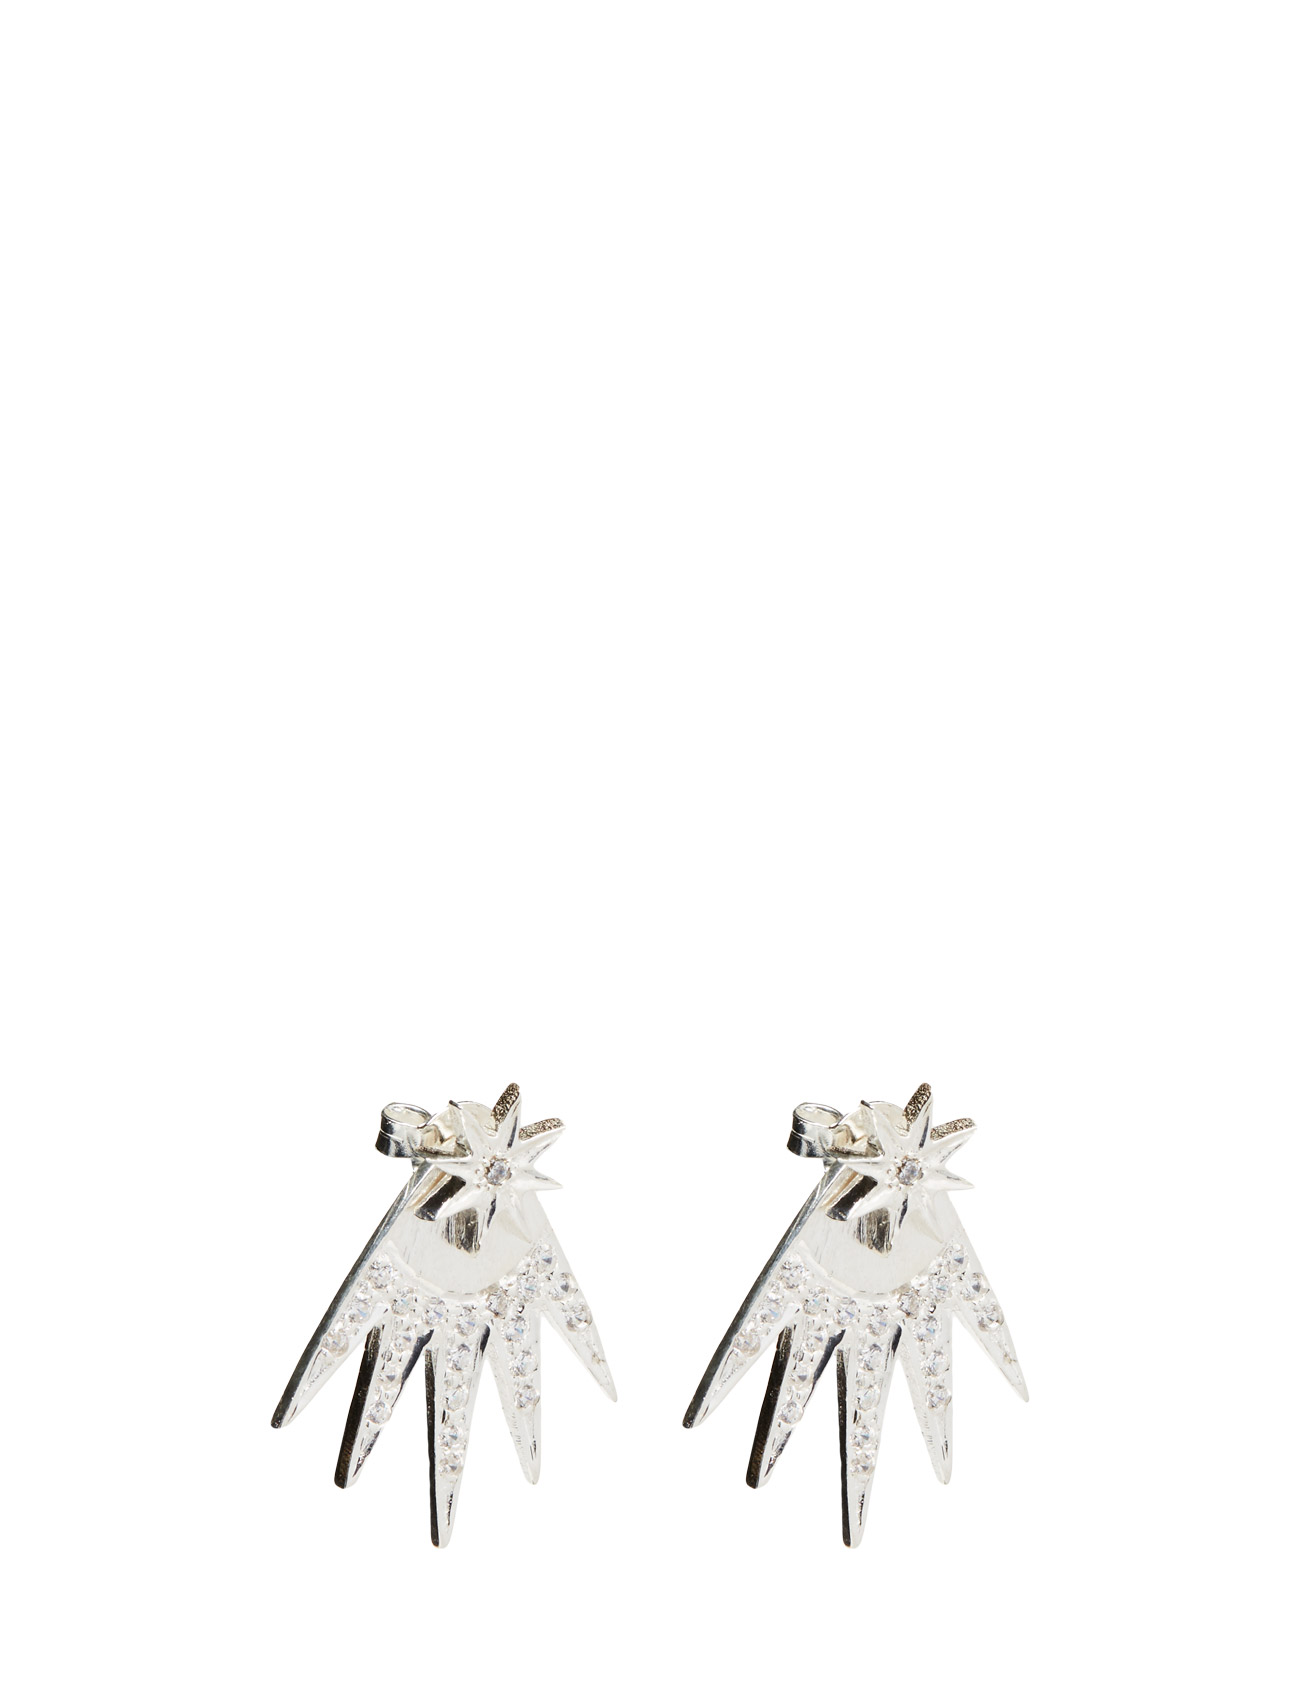 gaia jewels – Viol with zirconia på boozt.com dk